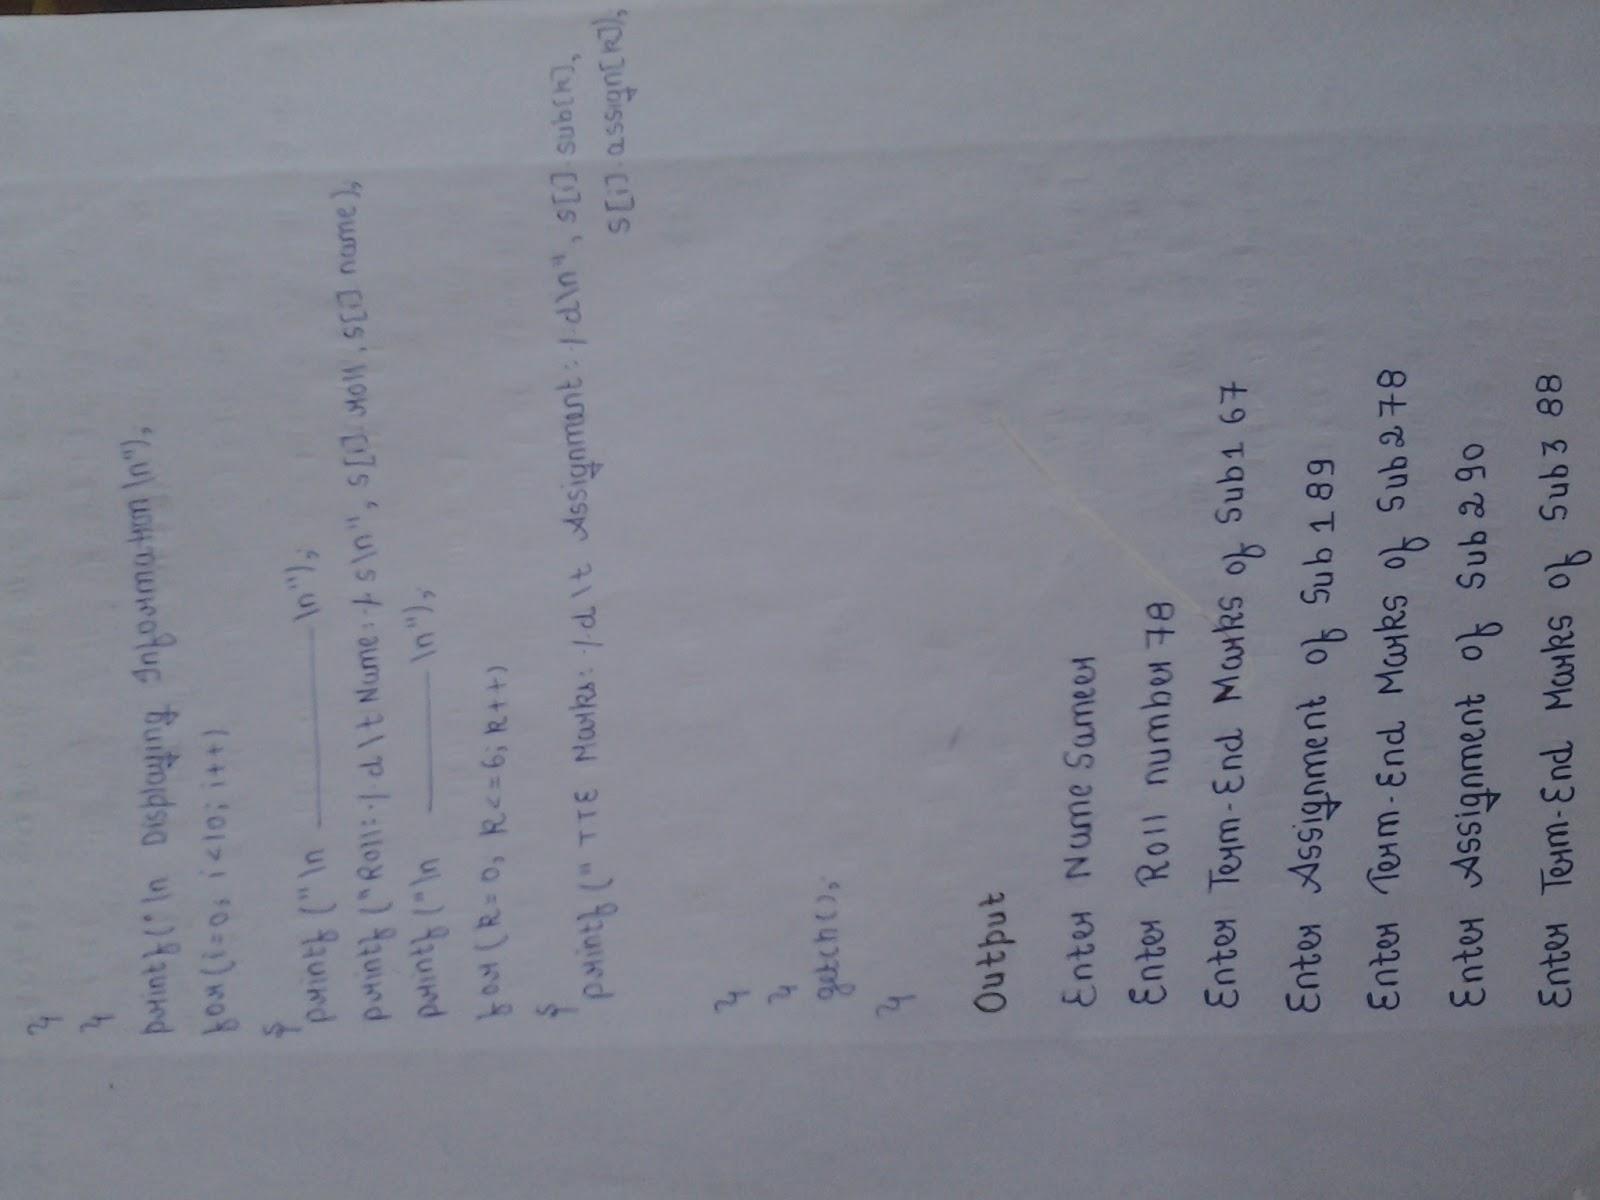 mcse 011 mca 5 ignou Ignou study centre 1617(p) vishwakarma institute of technology mca tentative schedule for aug to dec 2017 th 011 mcse-011(th) 14/10/2017 mcs-23 mcsl-25 mcs-32 mcsl-36 mcse-011 mcse.